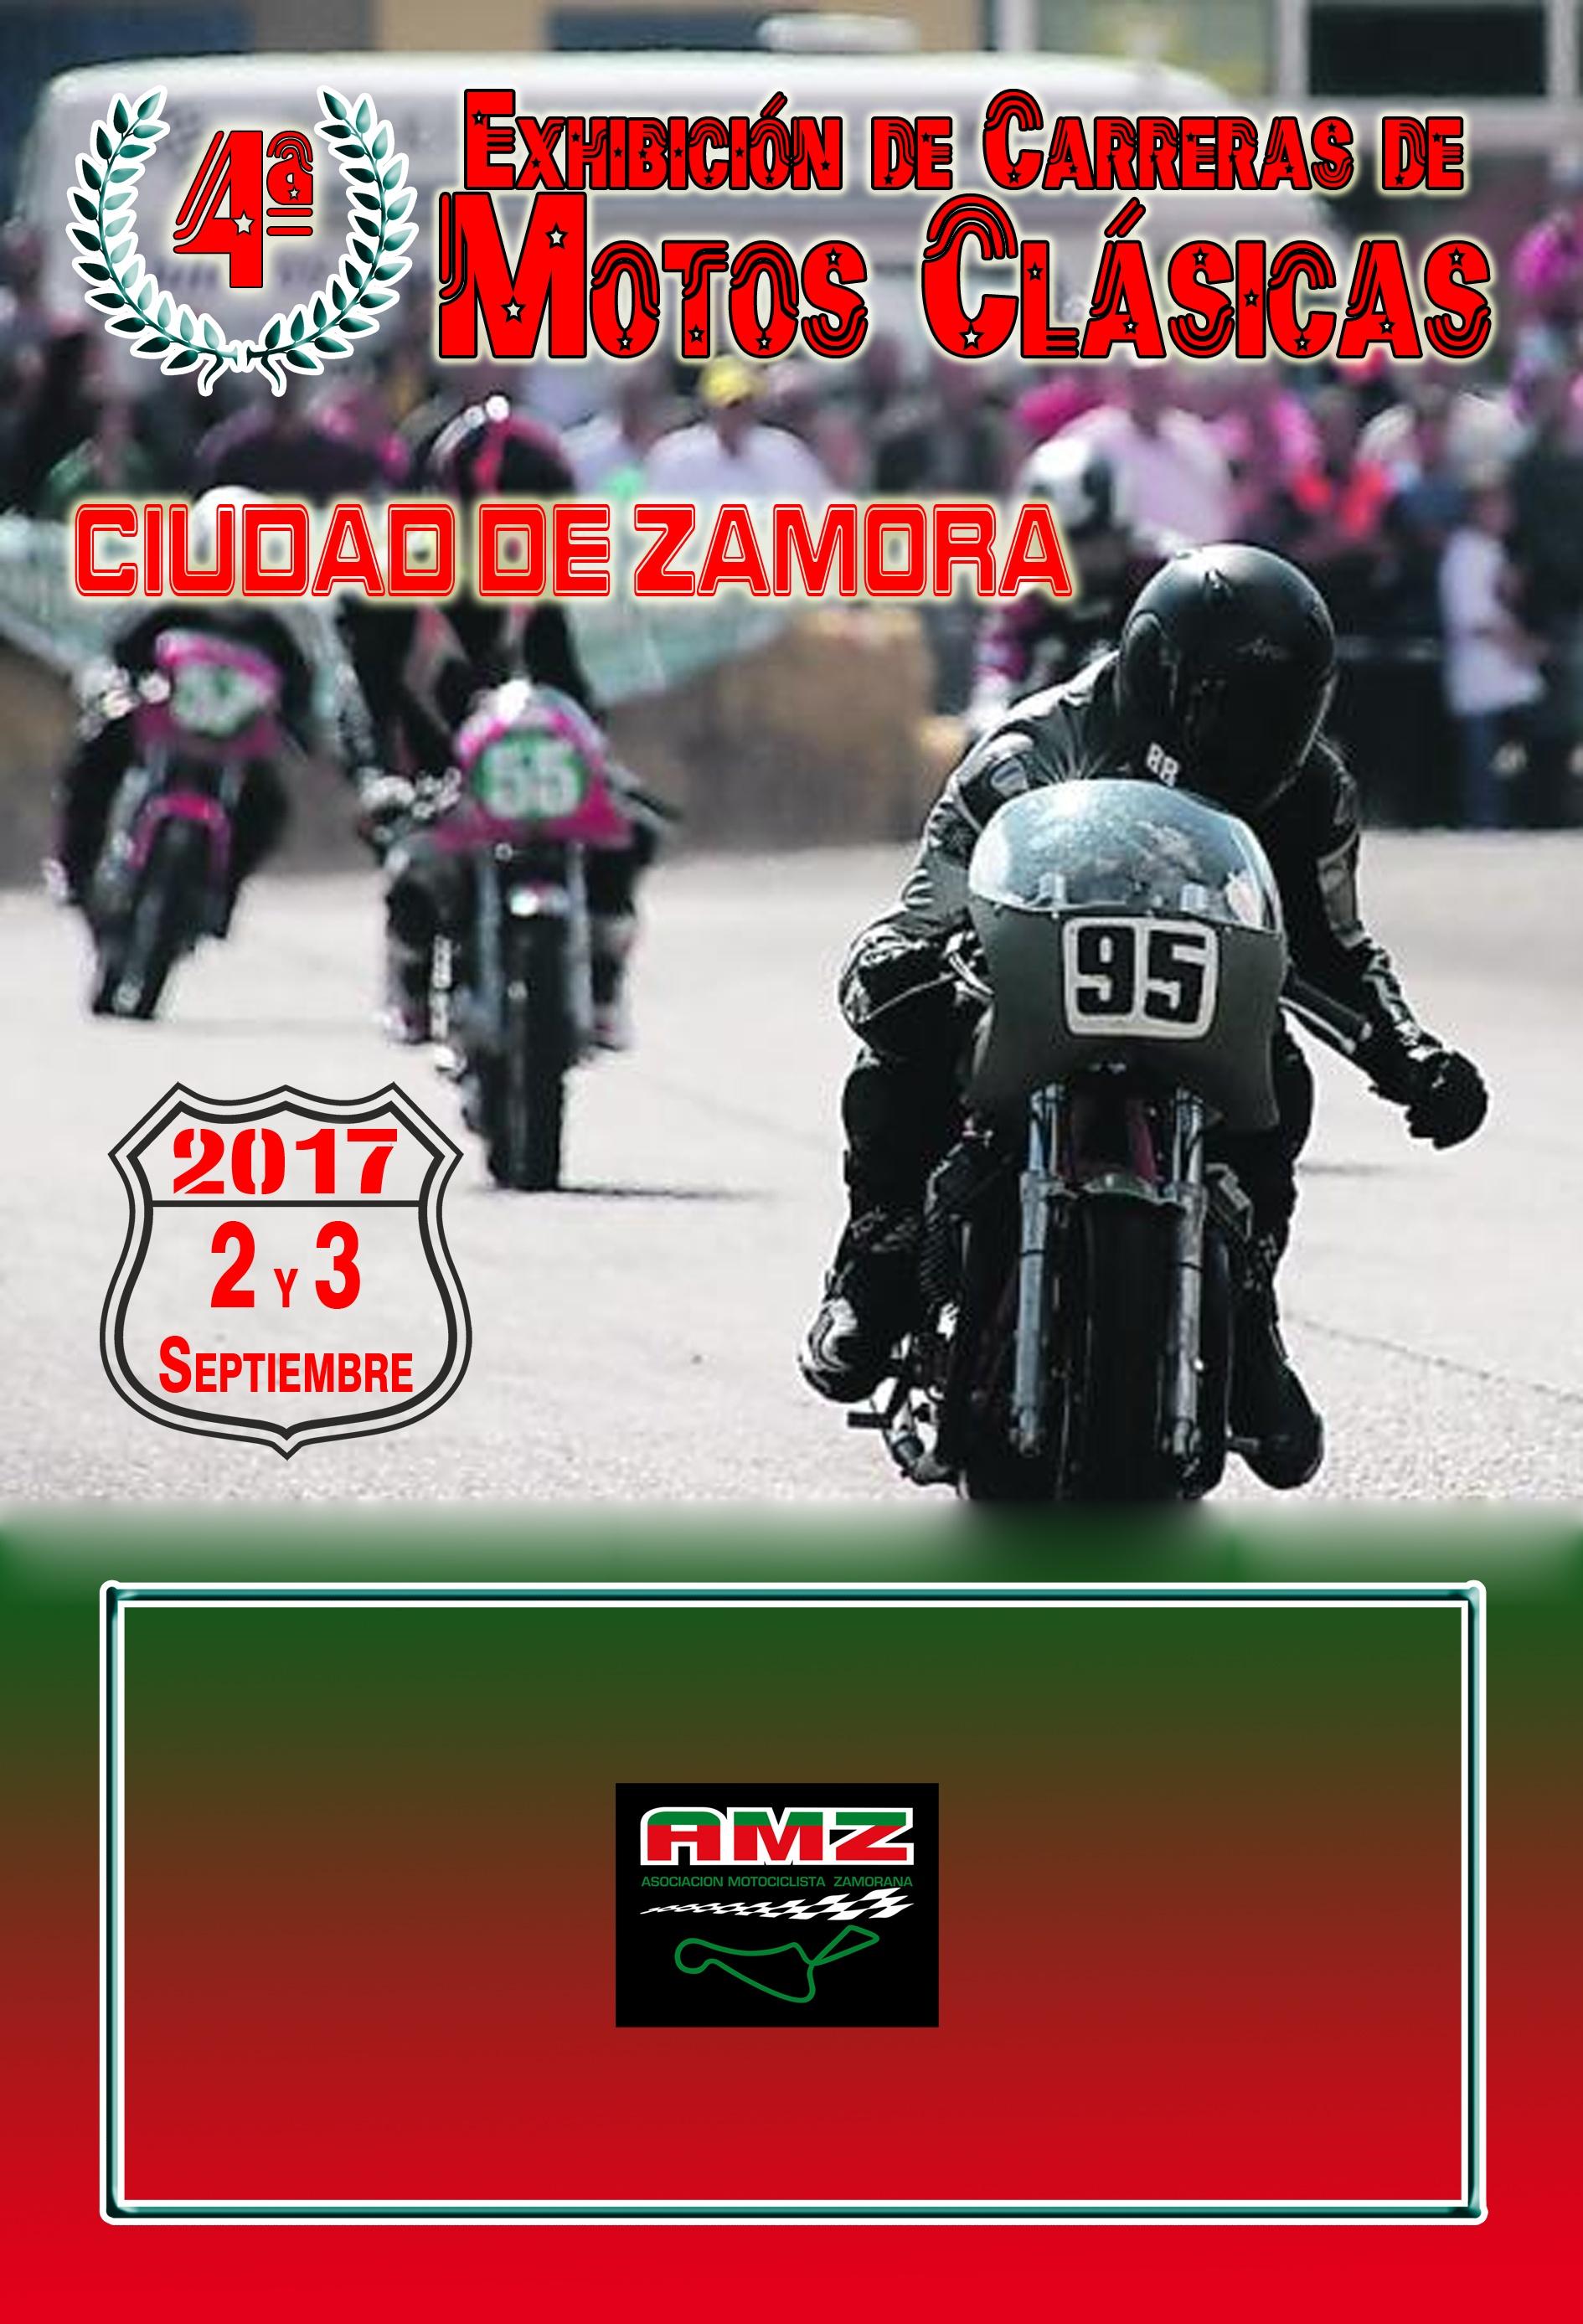 Exhibición Clásicas de carreras en Zamora